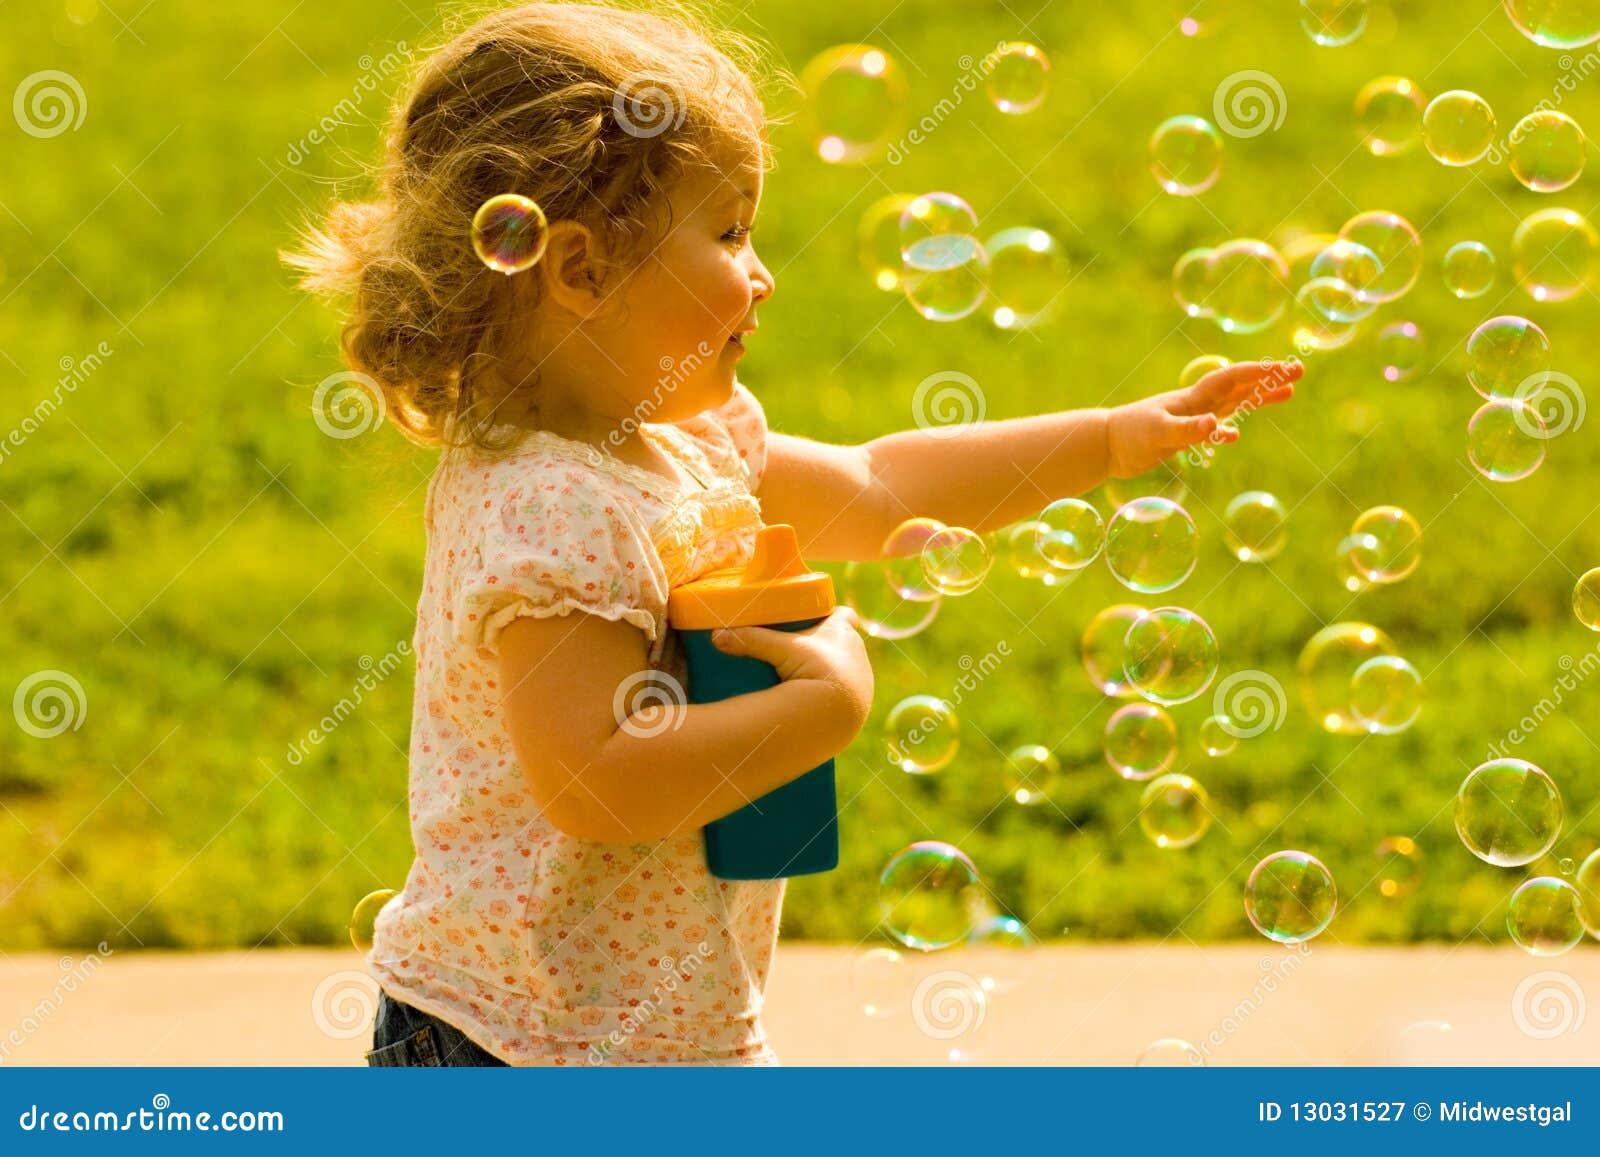 Happy Child Chasing Soap Bubbles